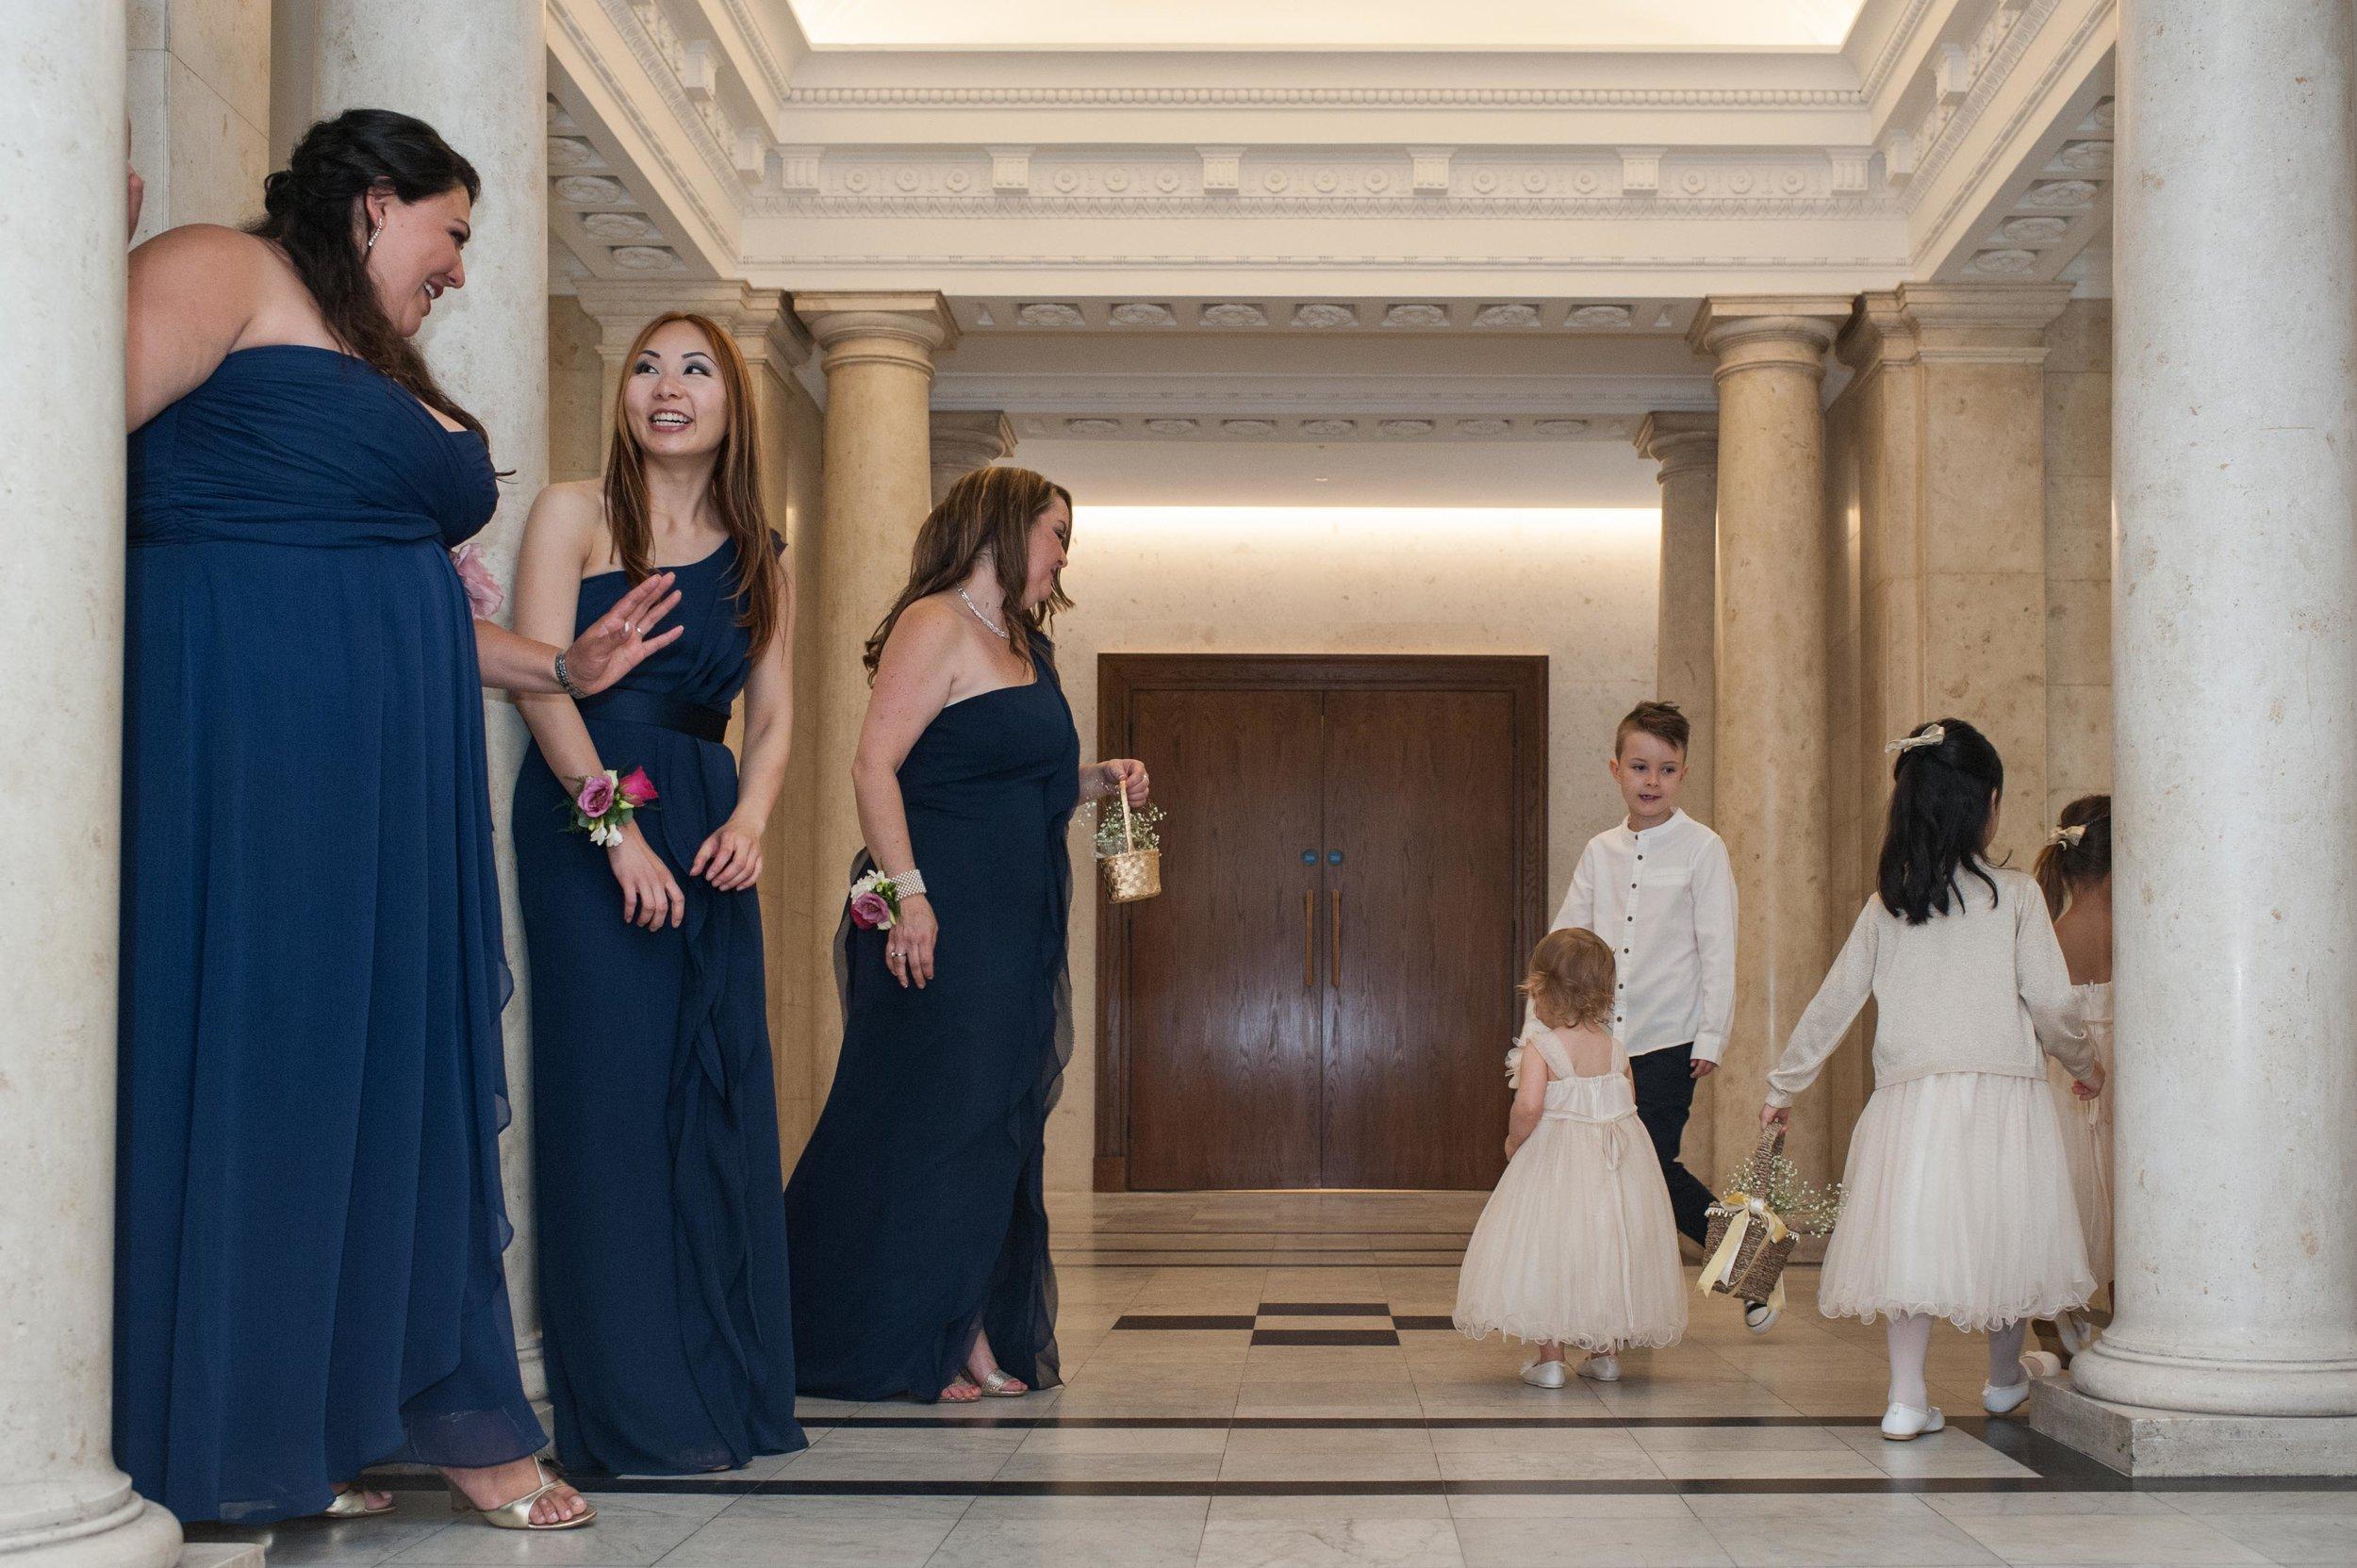 D&M_Marylebone Town Hall Wedding (69 of 239).jpg